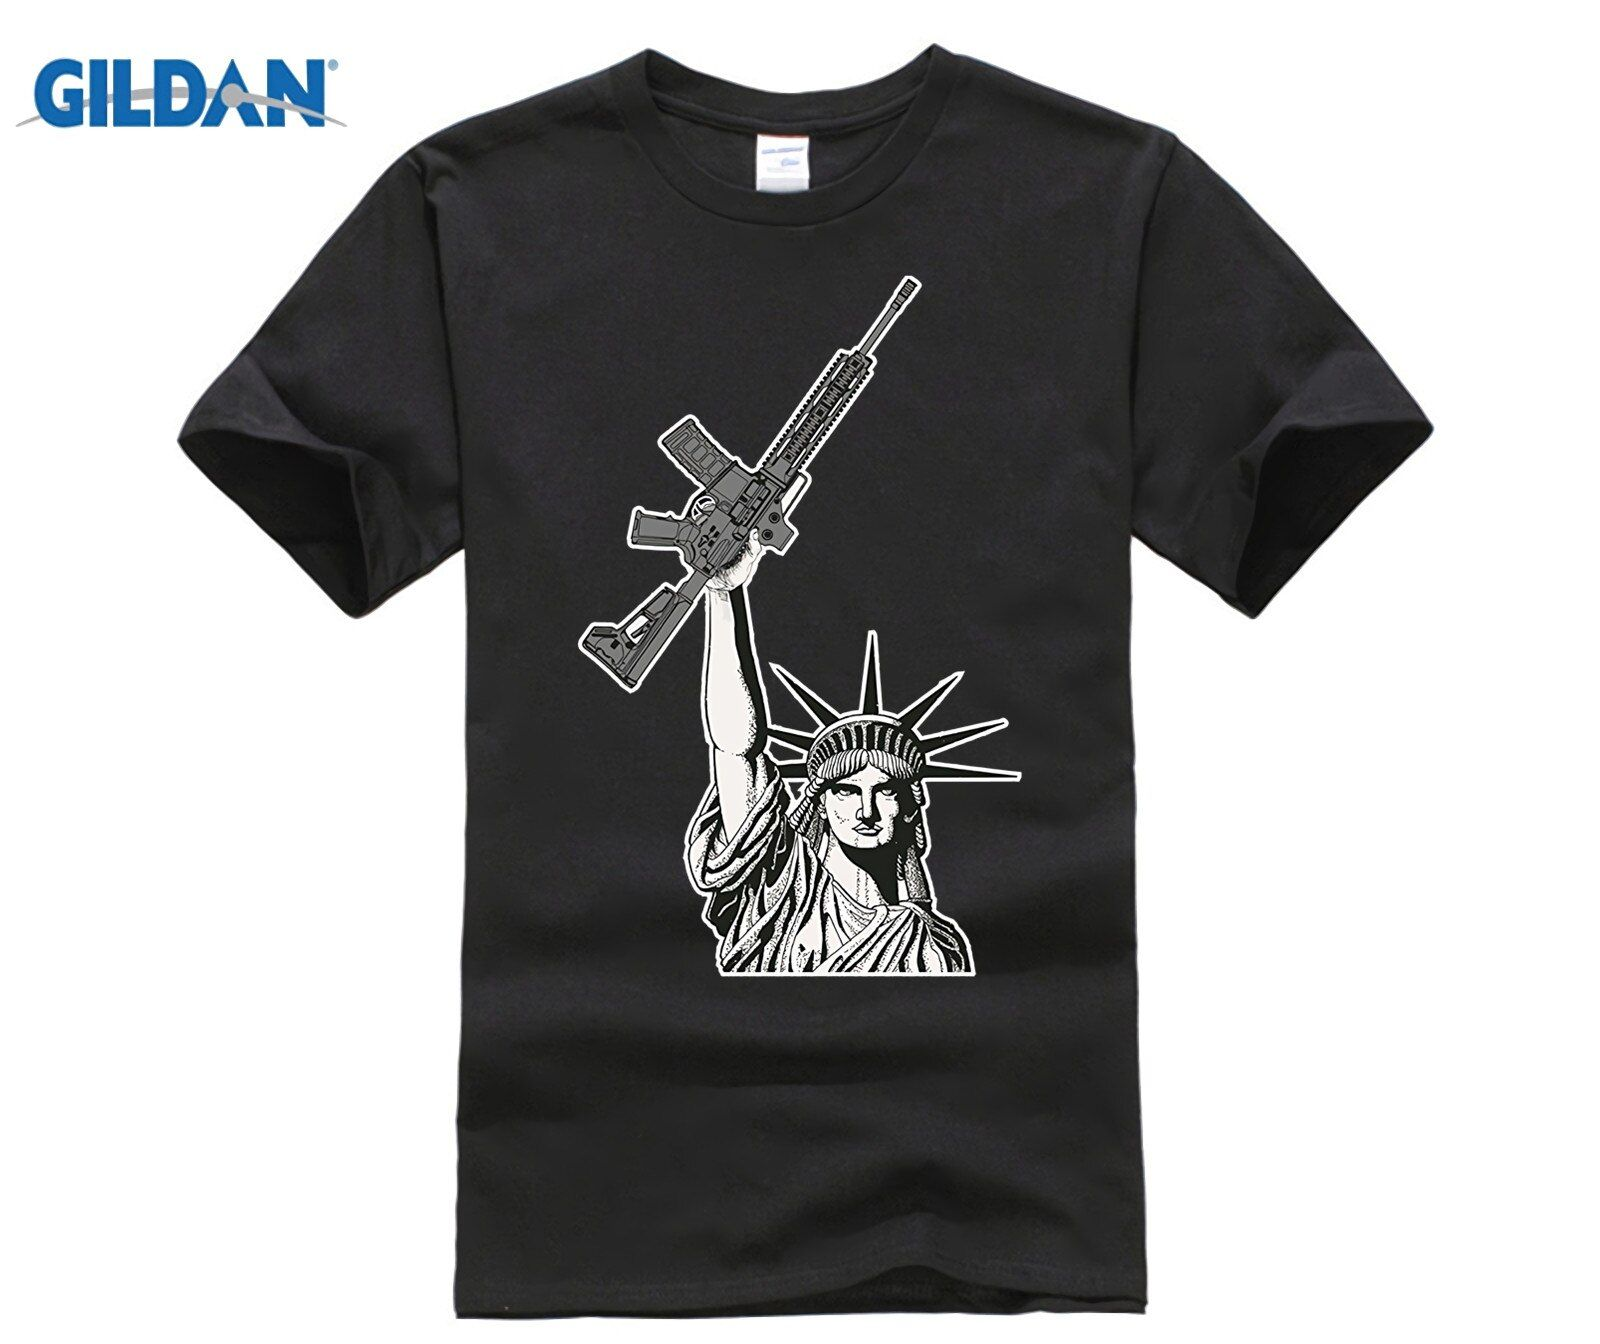 GILDAN 2018 Statue Of Liberty With Gun T Shirt Funny Rifle Gun Control